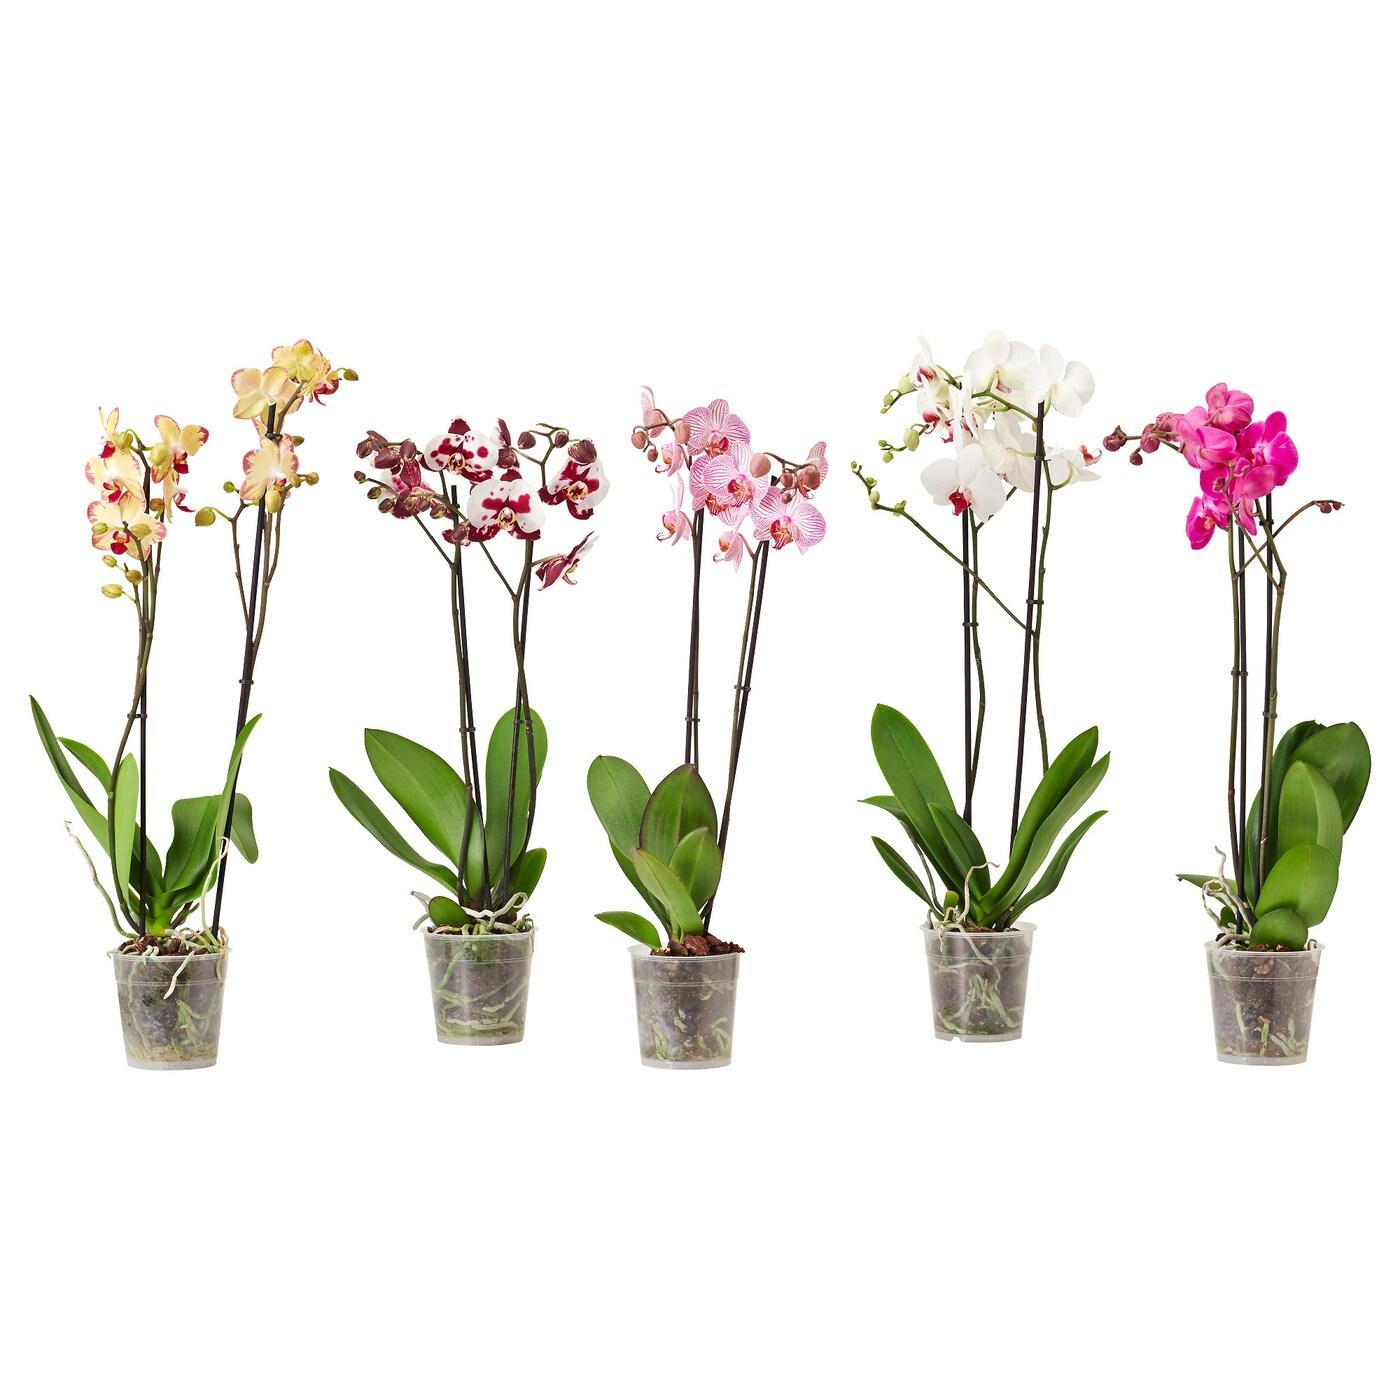 Plants cacti house plants potted plants ikea - Plantas trepadoras para muros ...